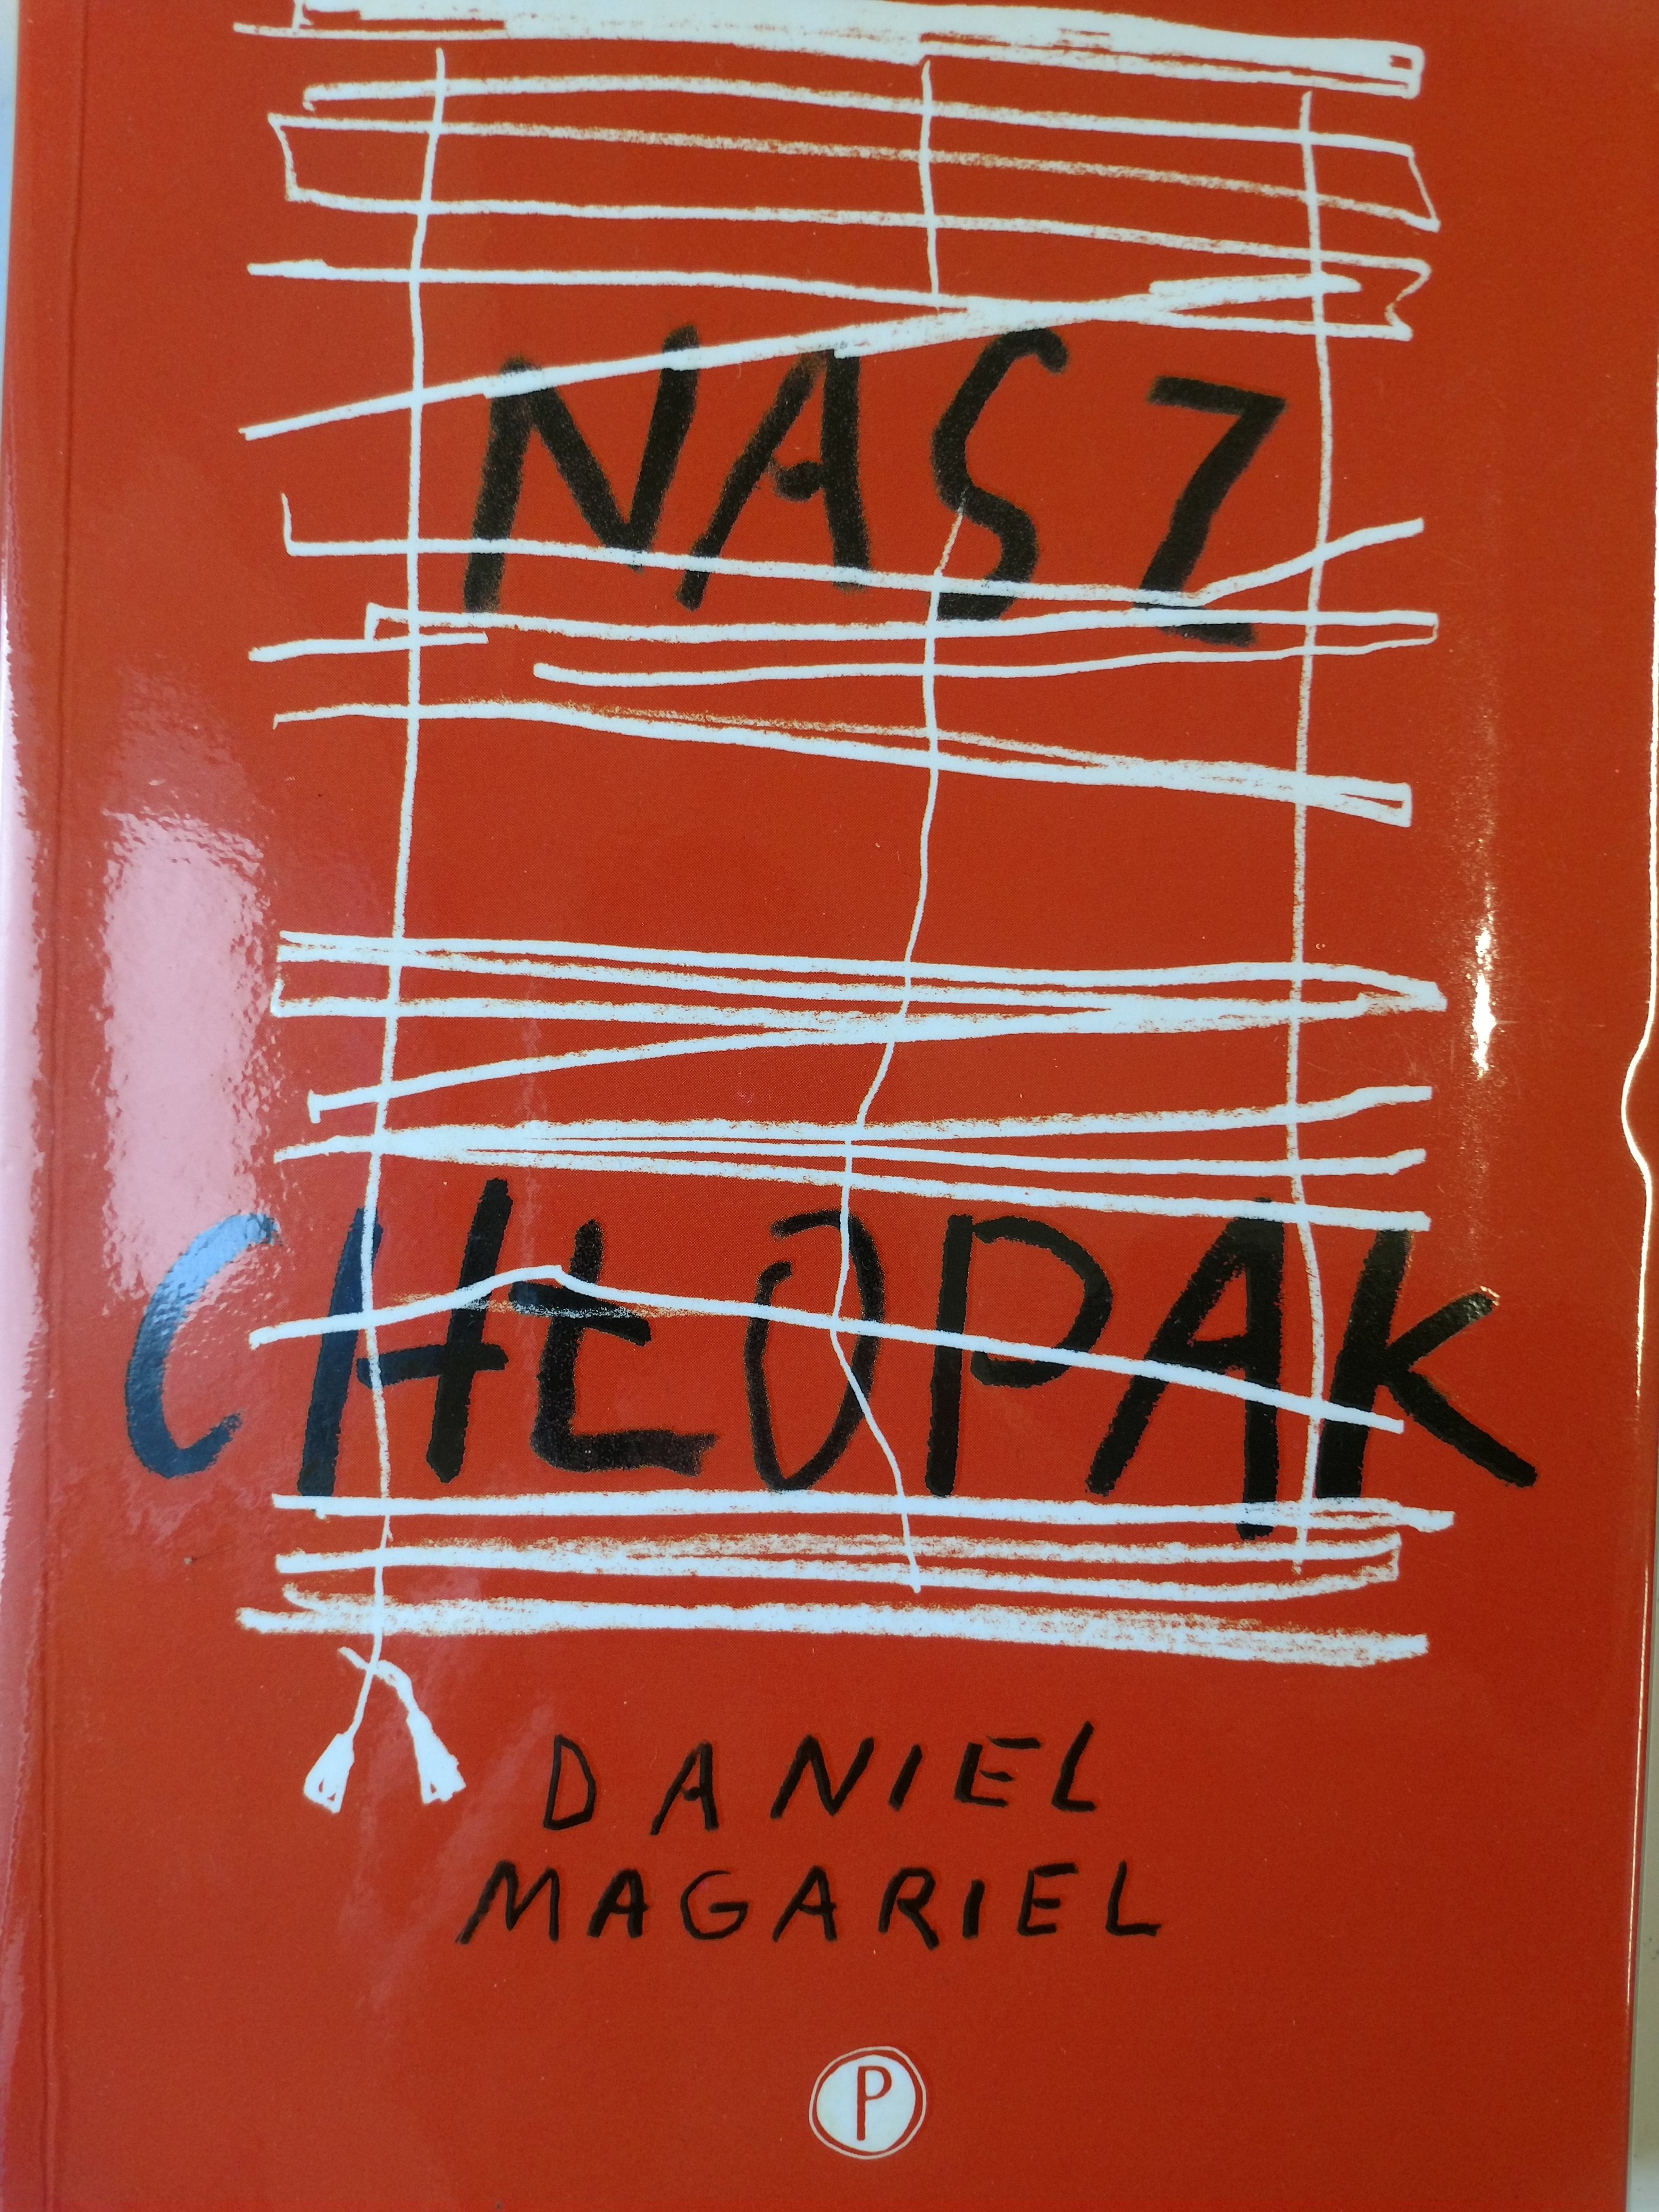 Nasz Chlopak - Daniel Magariel